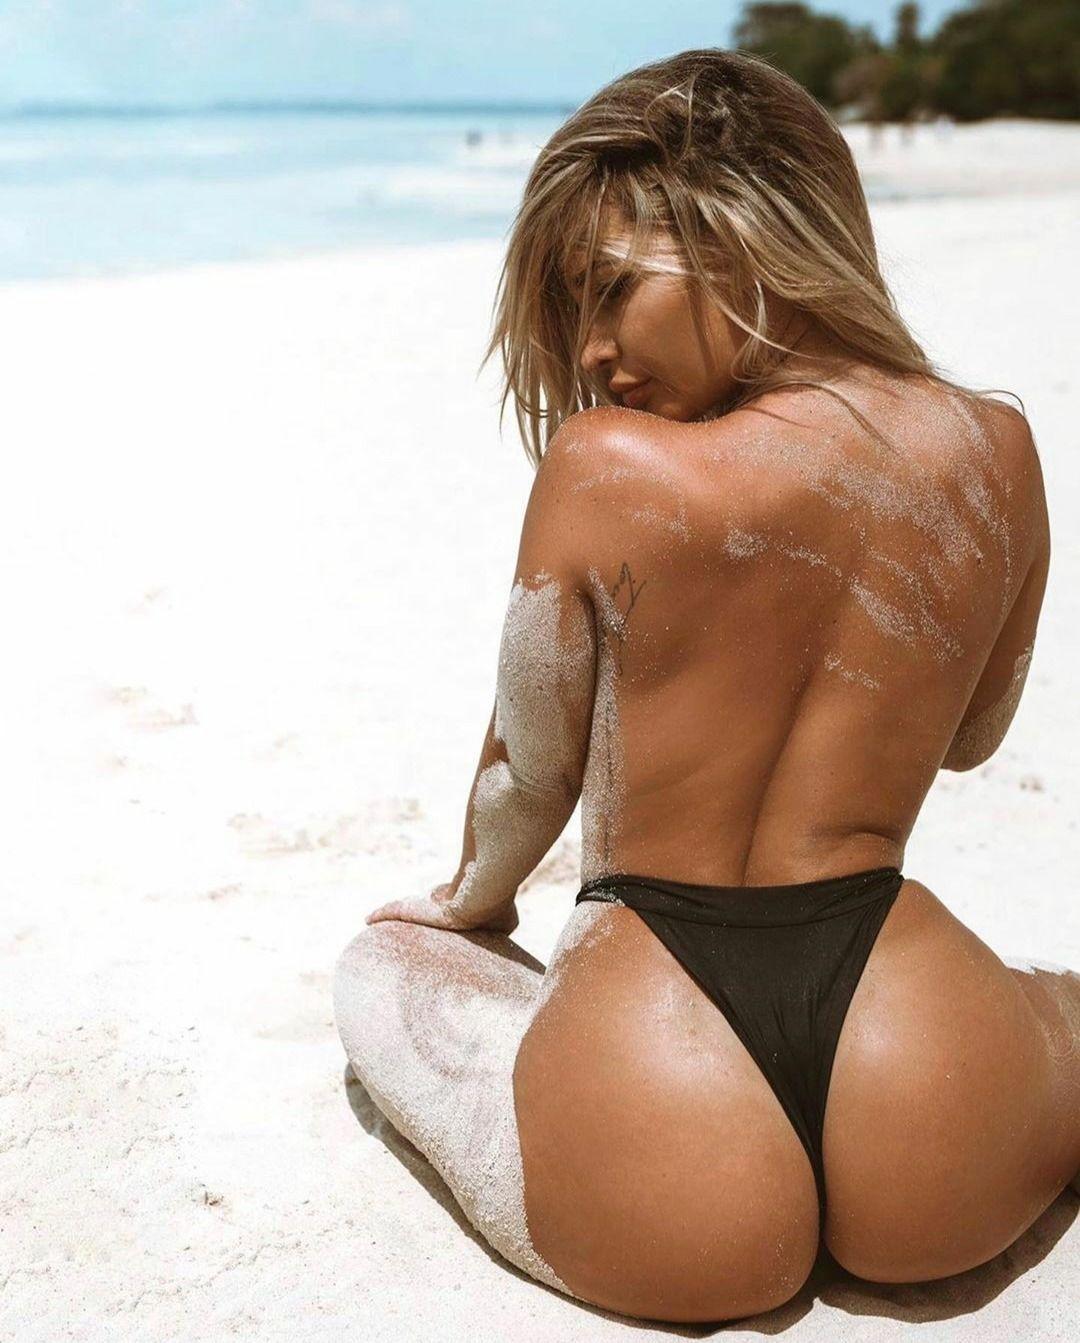 Sexy ass swimsuit